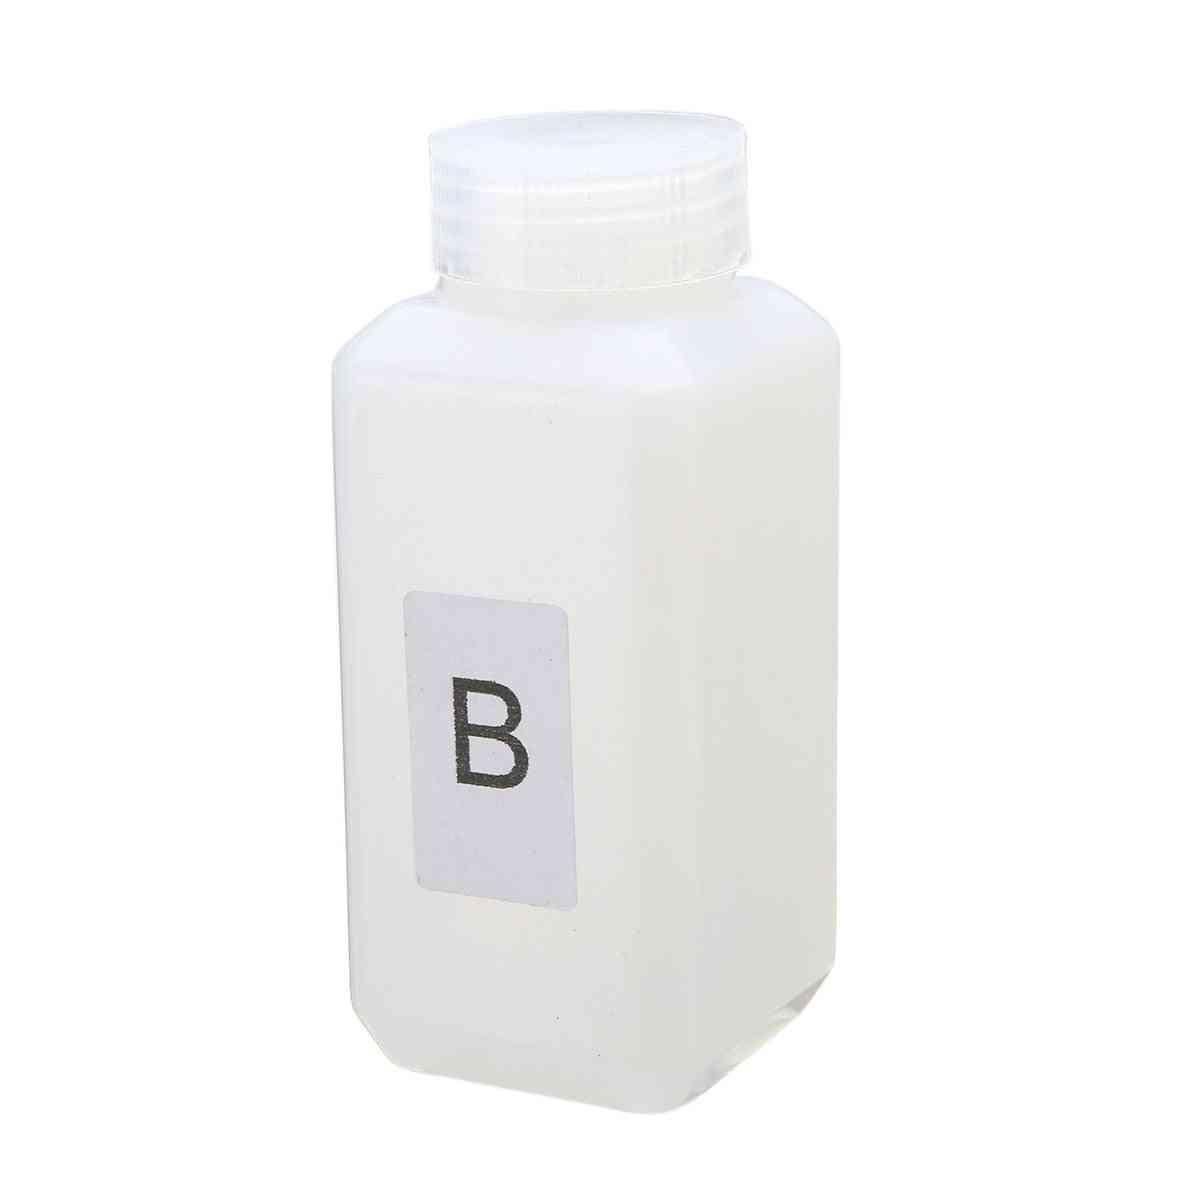 1 Bottle 50ml Activator B - Dip Water Transfer Printing Film